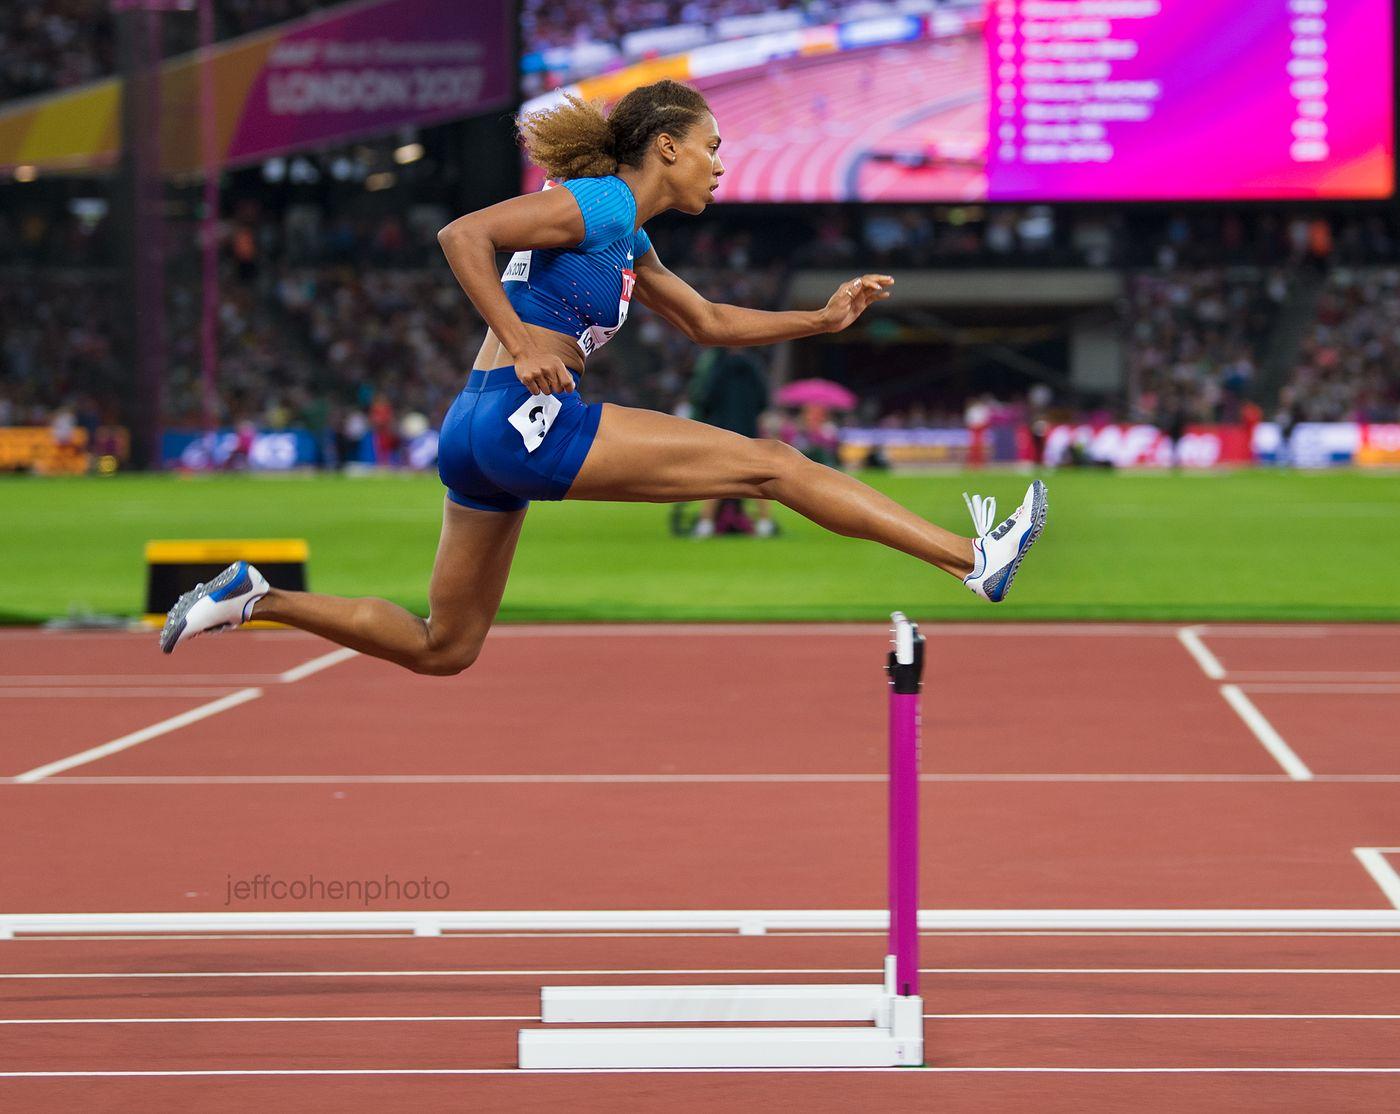 2017-IAAF-WC-London-night-4-kori-cartert-400mhw-2822-jeff-cohen-photo--web.jpg